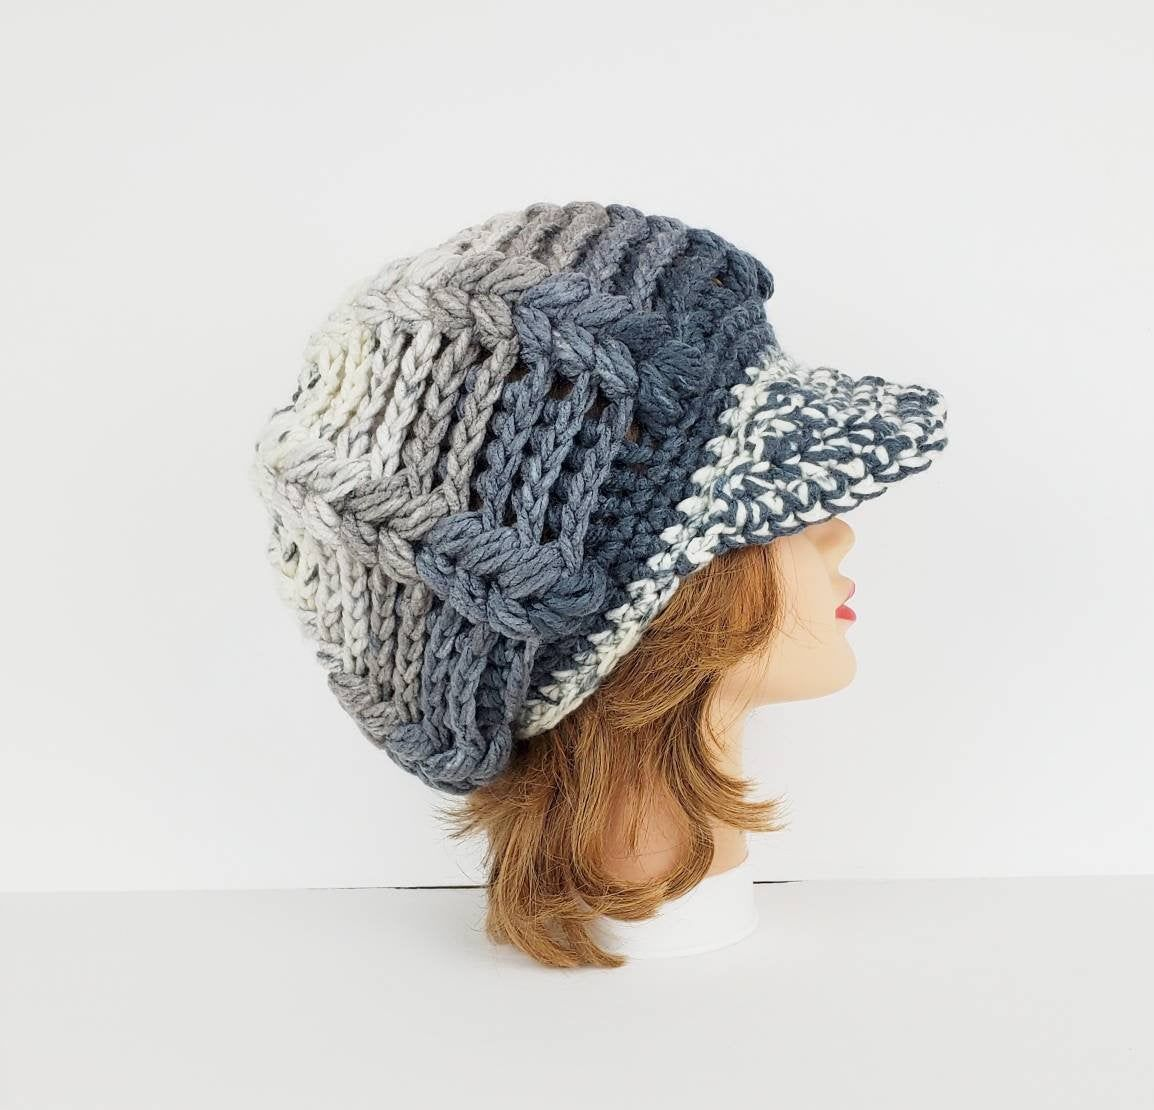 Women S Newsboy Hat Women S Visor Hats Crochet Hats Etsy Crochet Beanie Hat Crochet Newsboy Hat Crochet Hat For Women